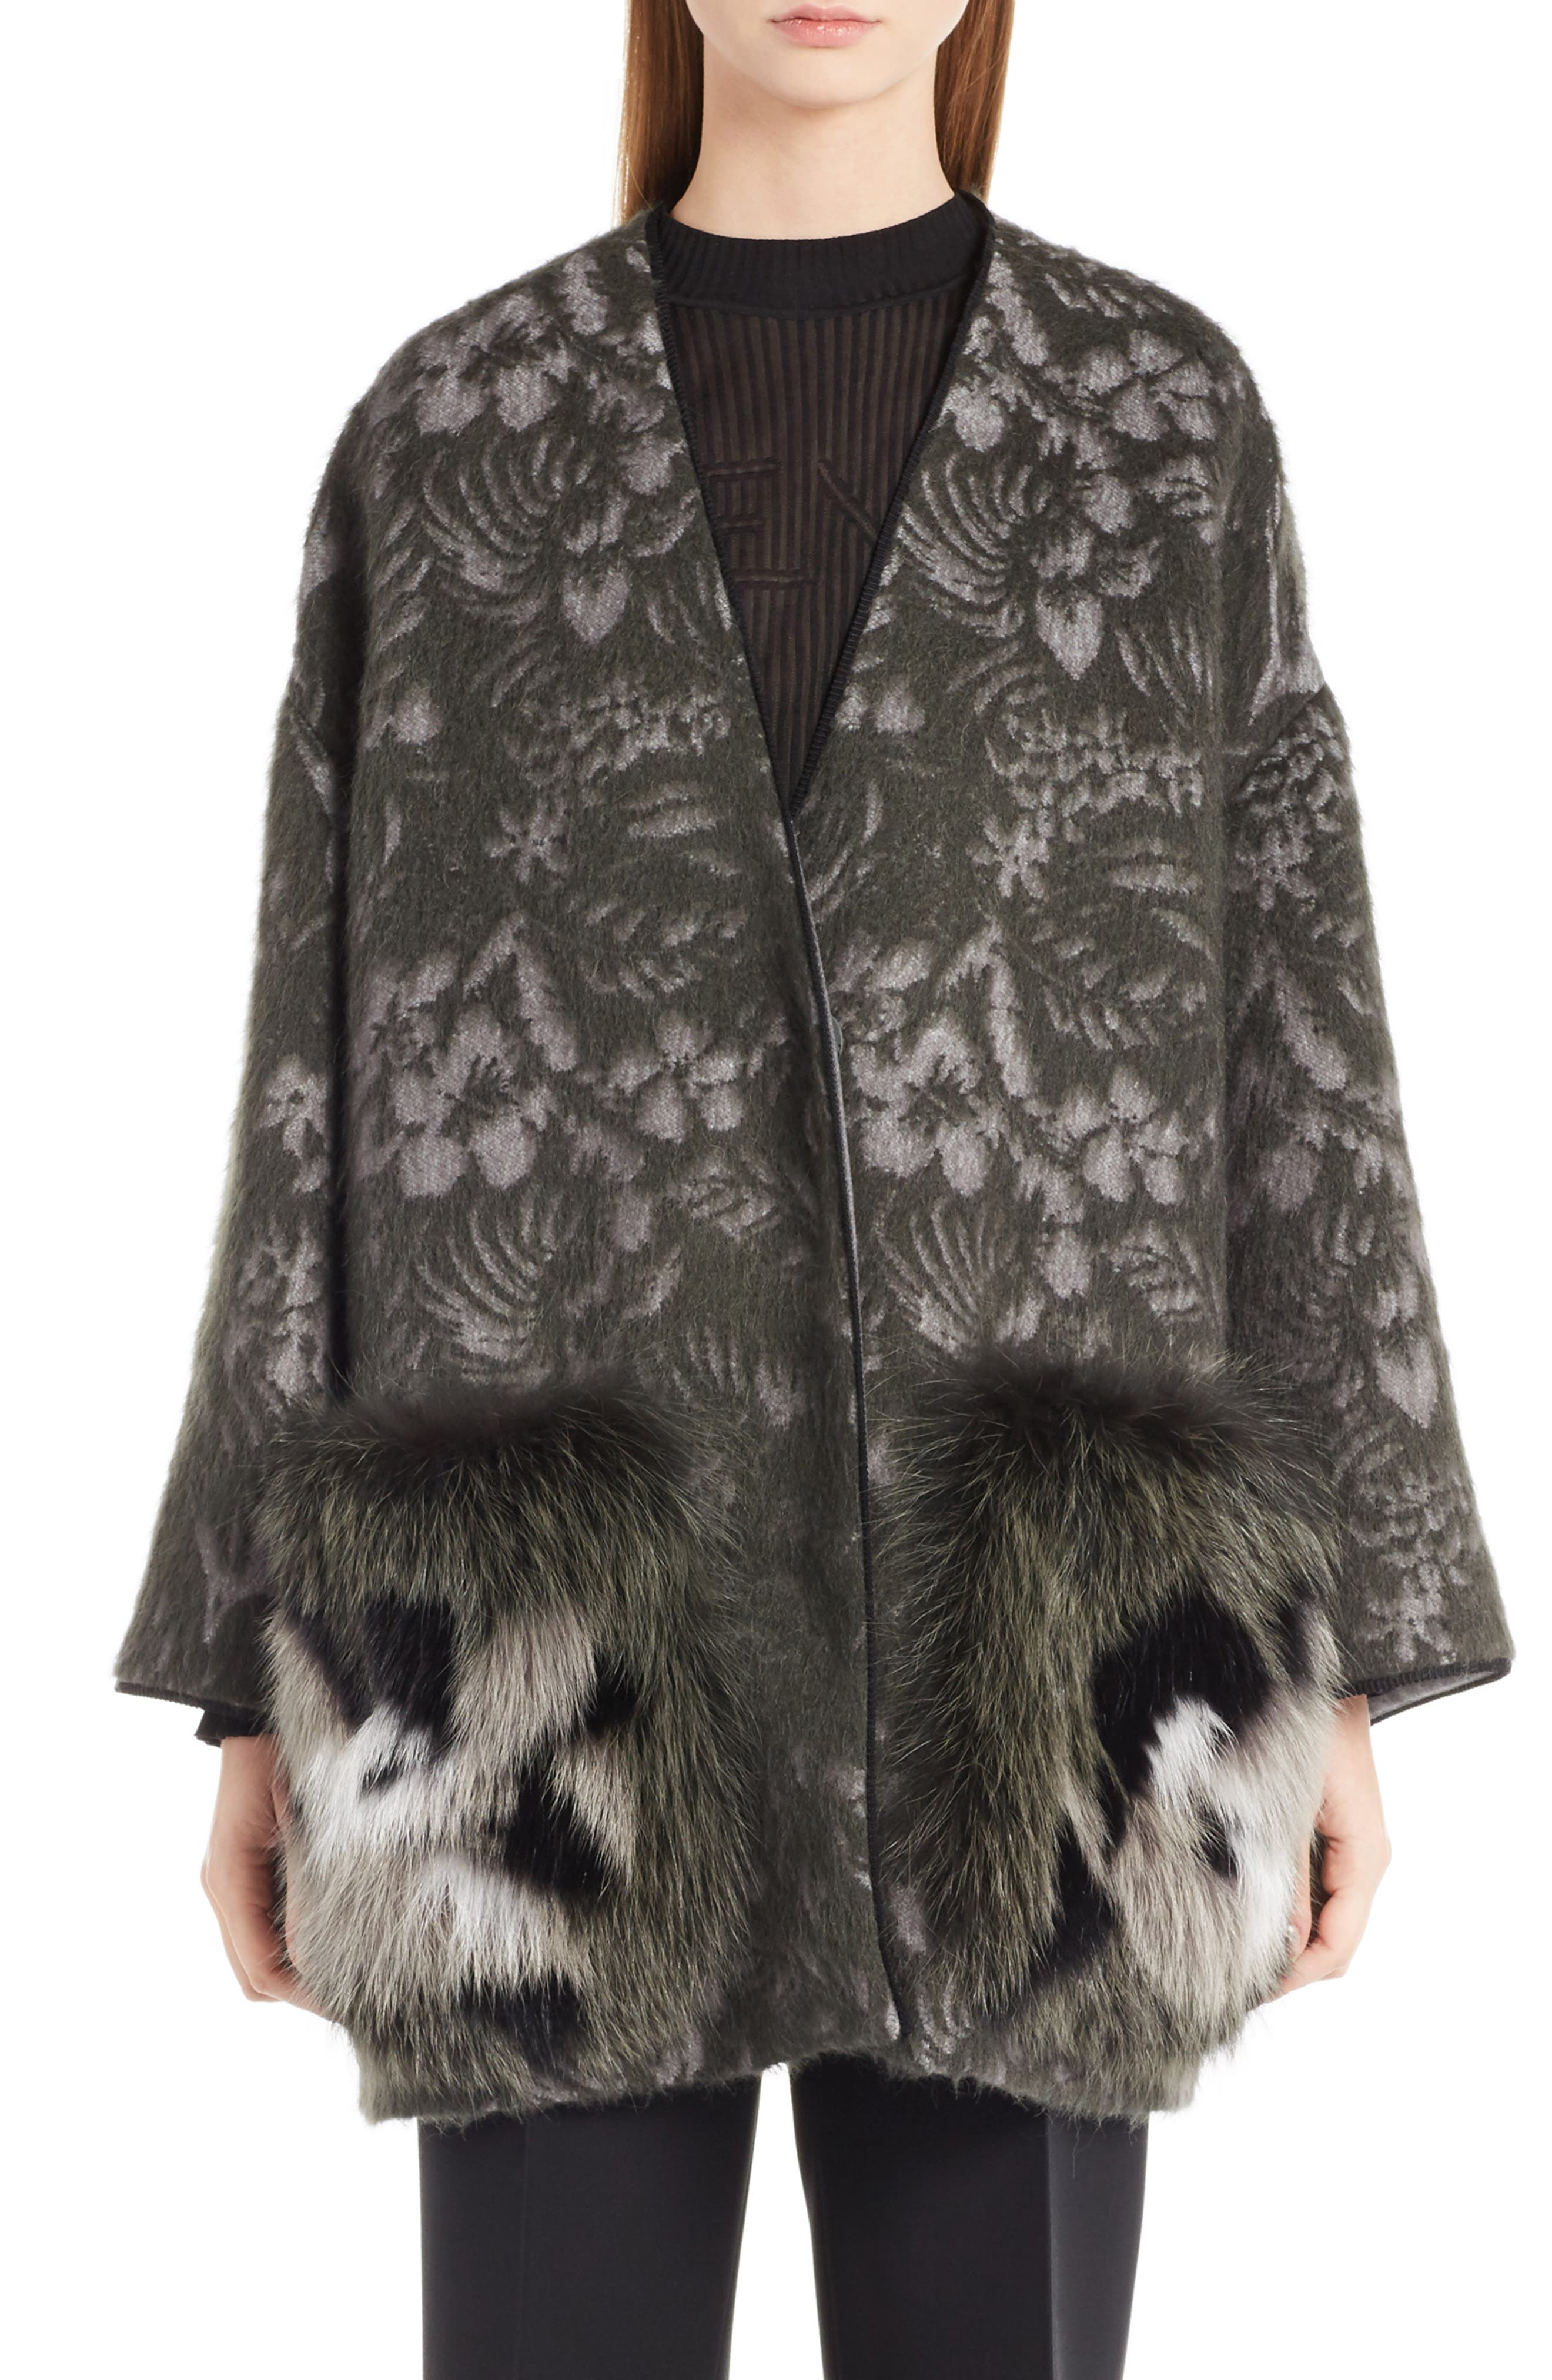 Fendi Floral Jacket with Genuine Fox Fur Pockets